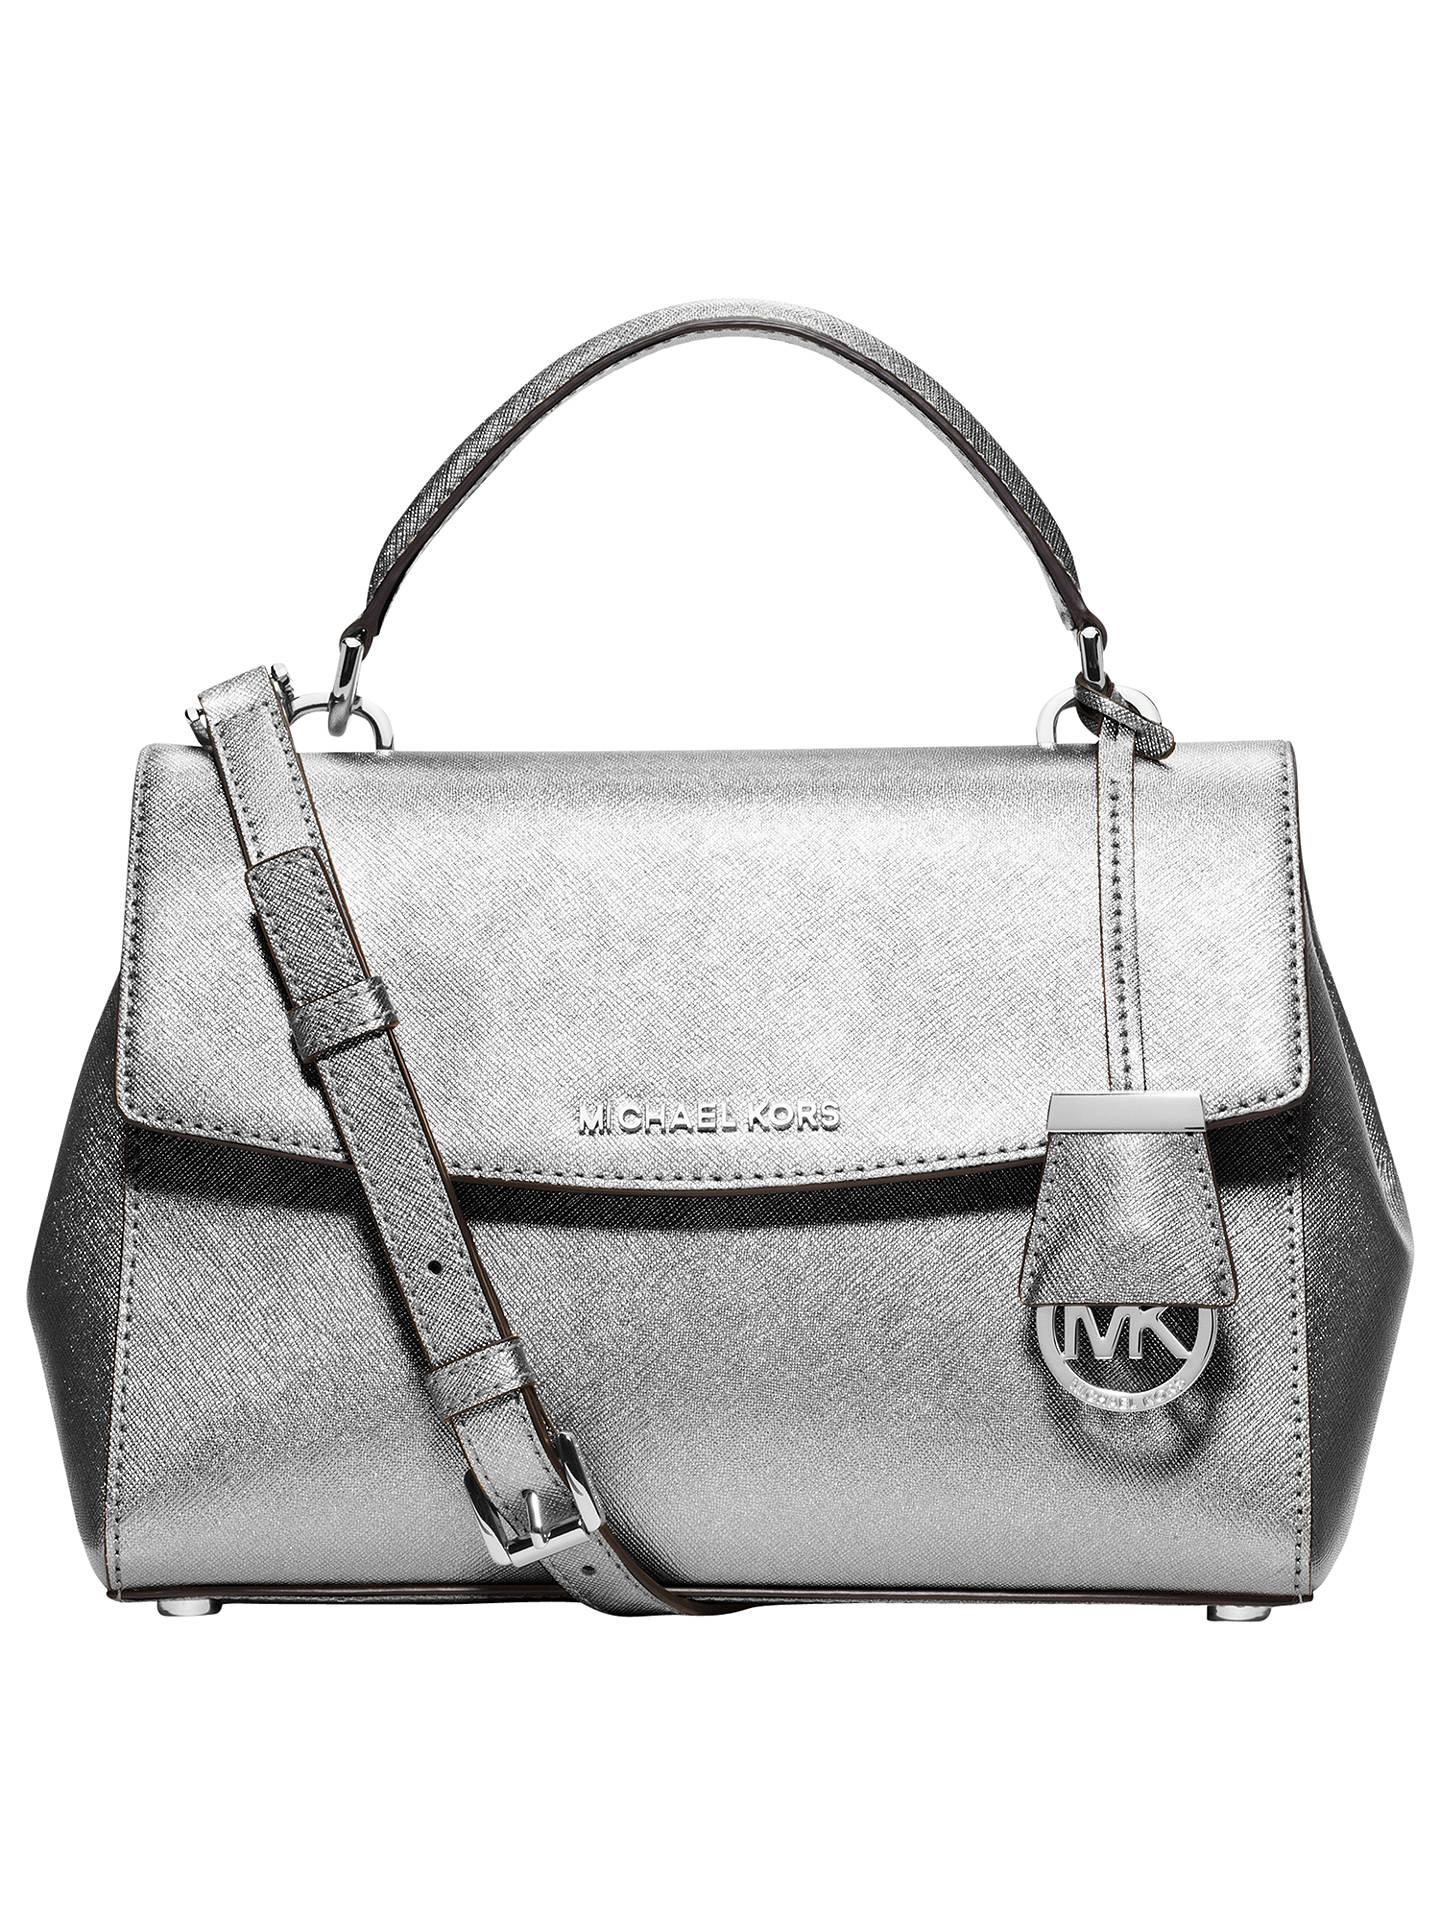 15f5381b16f3 Buy MICHAEL Michael Kors Ava Small Saffiano Leather Satchel, Silver Online  at johnlewis.com ...